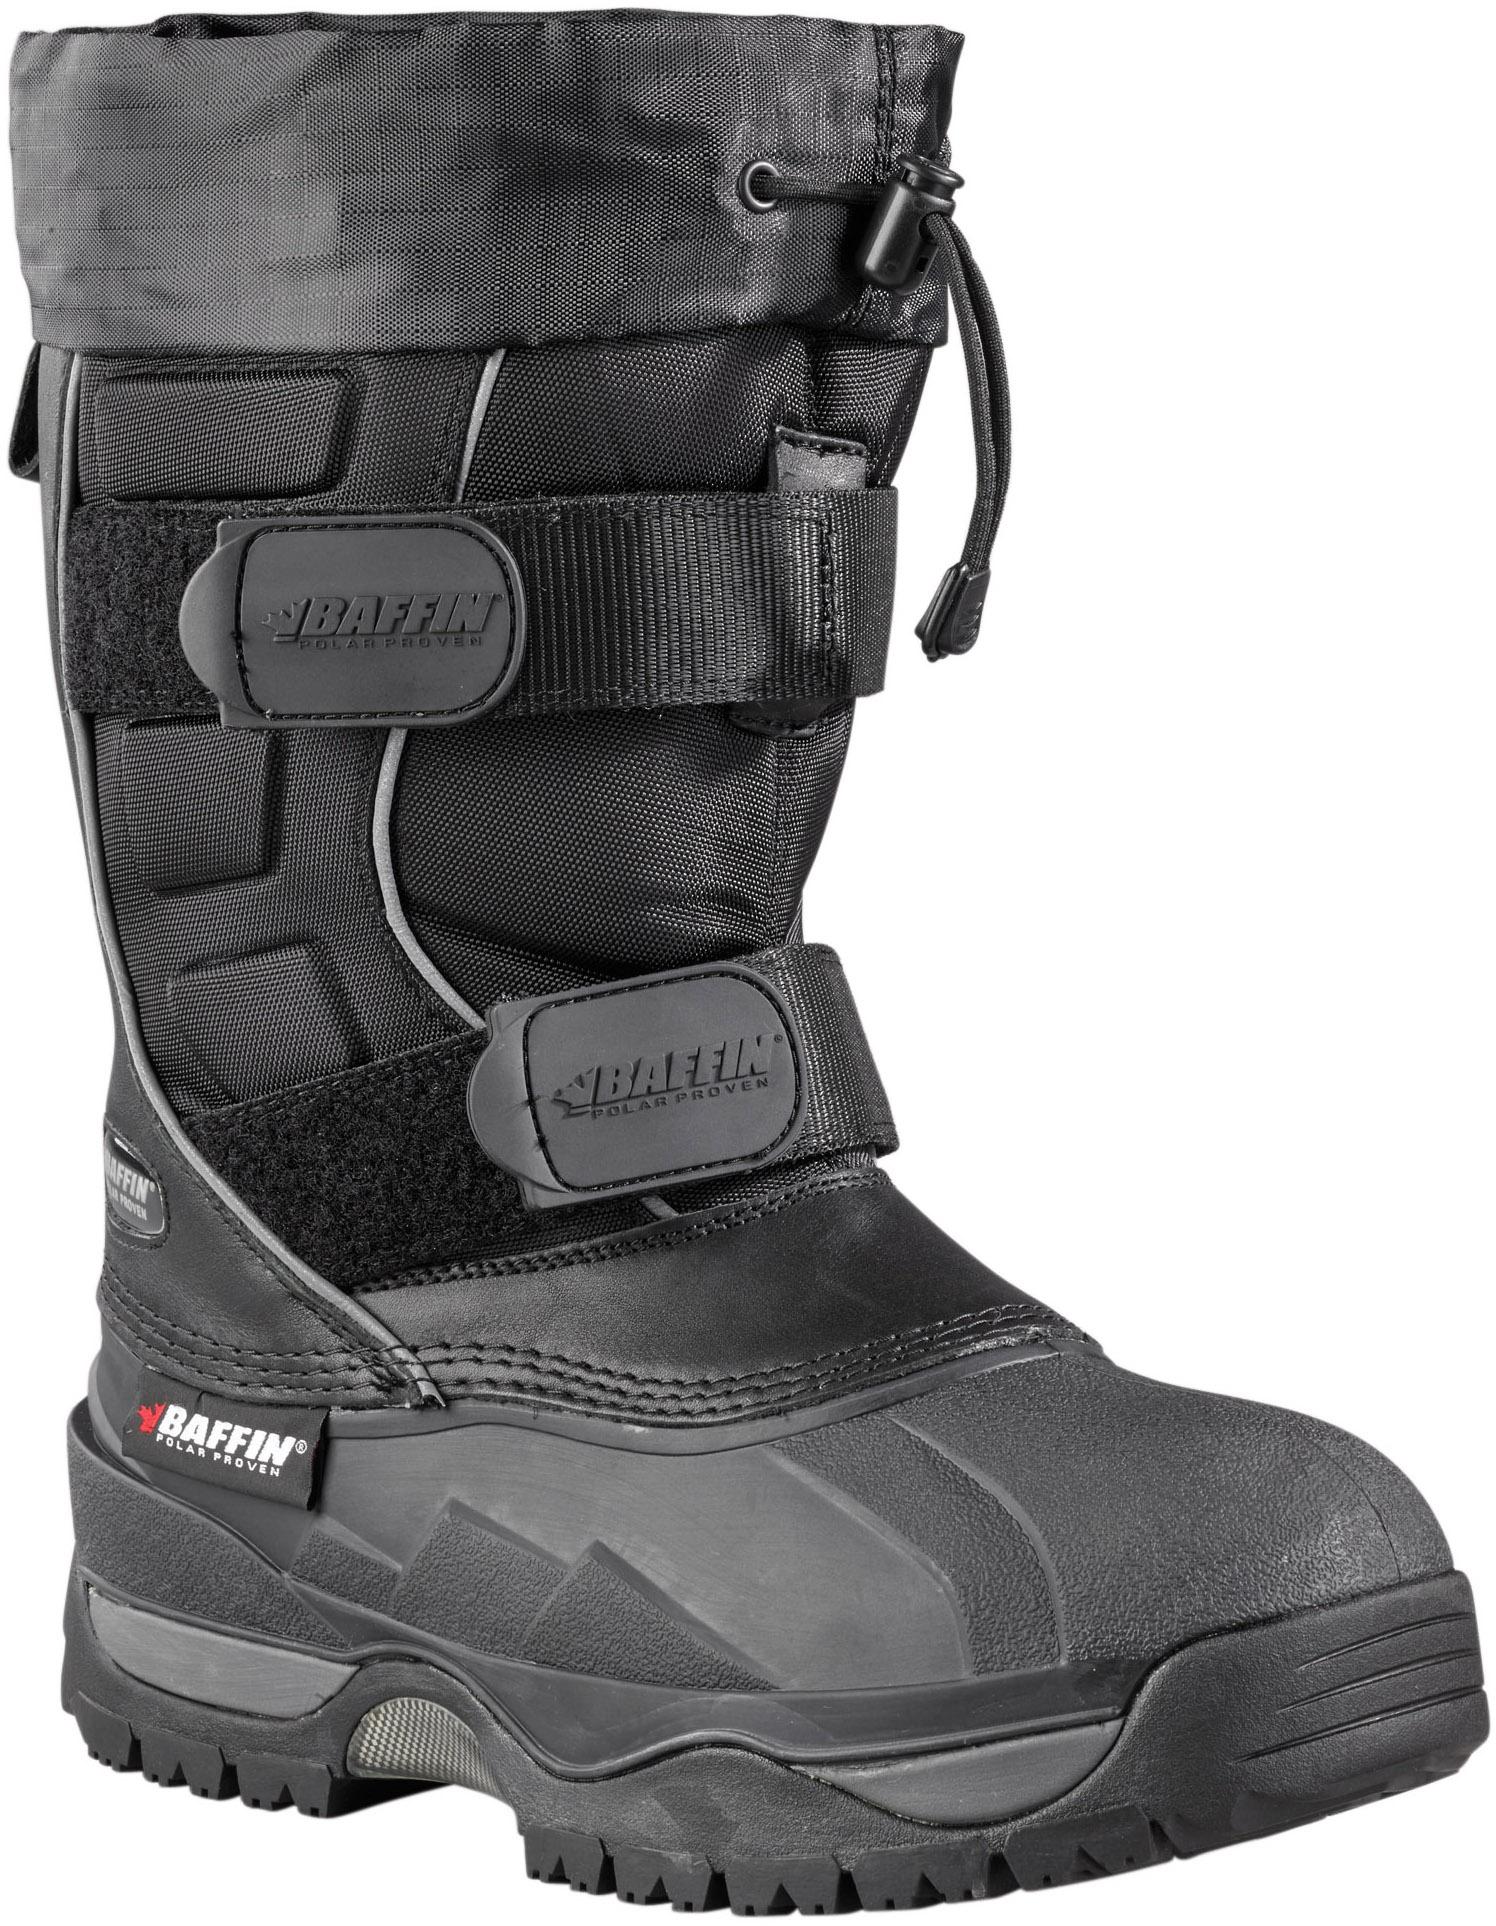 6c53b996da63 Baffin Eiger Winter Boots - Men s